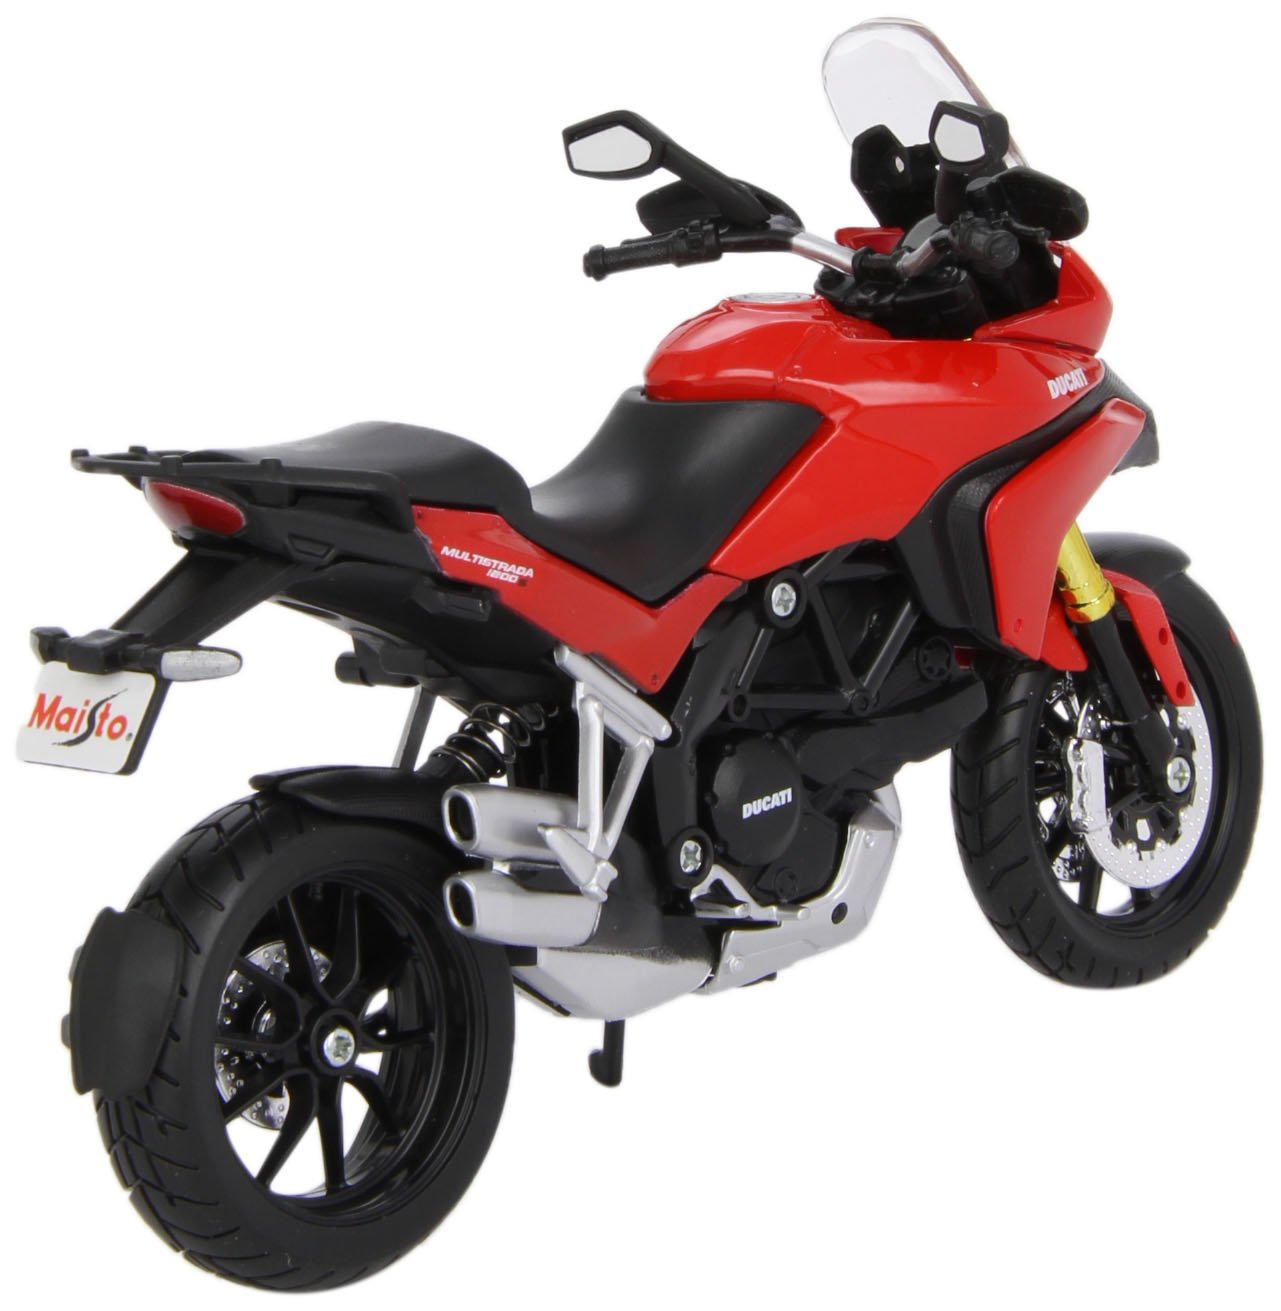 escala 1:12 Maisto 531188 Ducati Multistrada 1200 MY 10 Moto miniatura colores surtidos